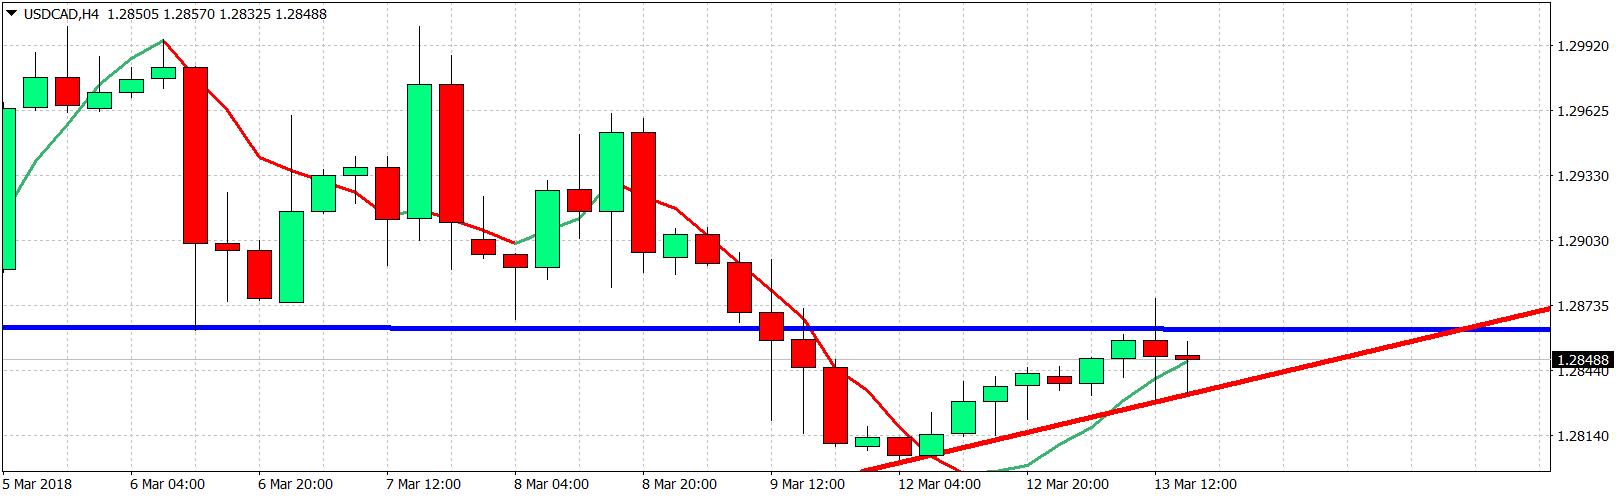 USD/CAD's Bullish Channel